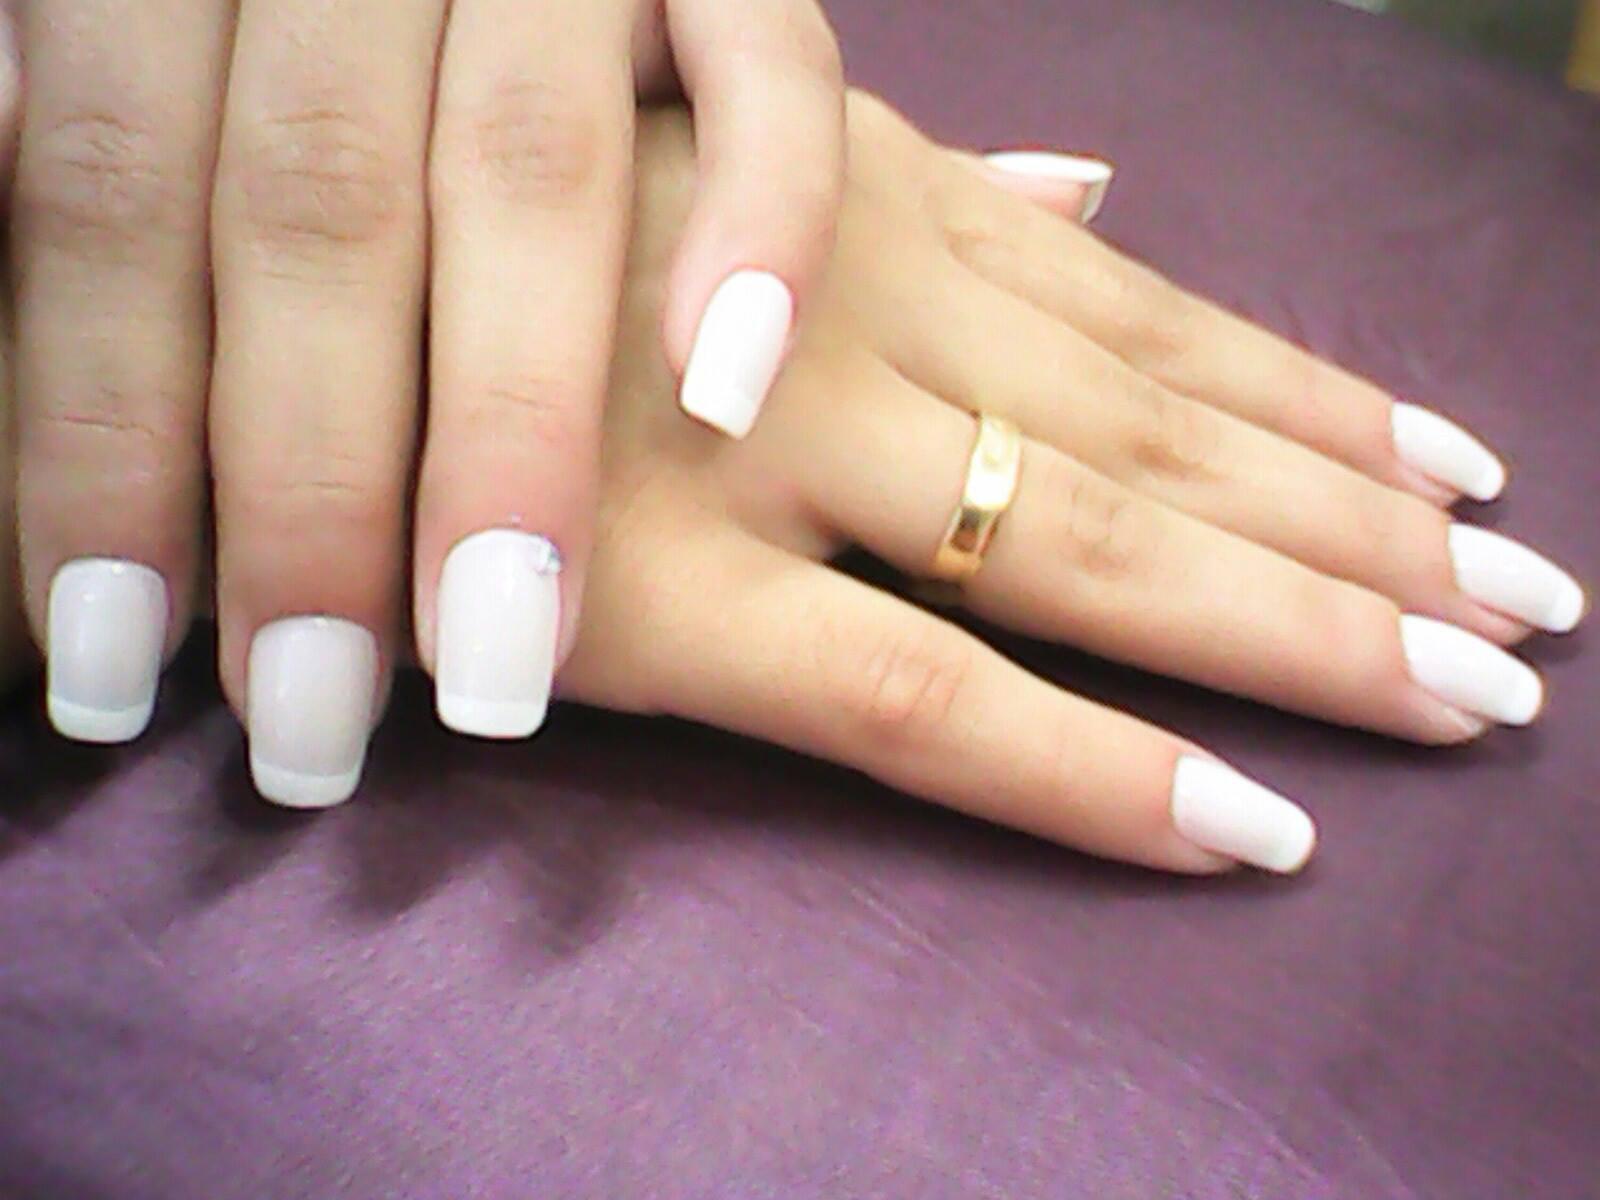 branco, francesinha unhas  manicure e pedicure depilador(a) massoterapeuta